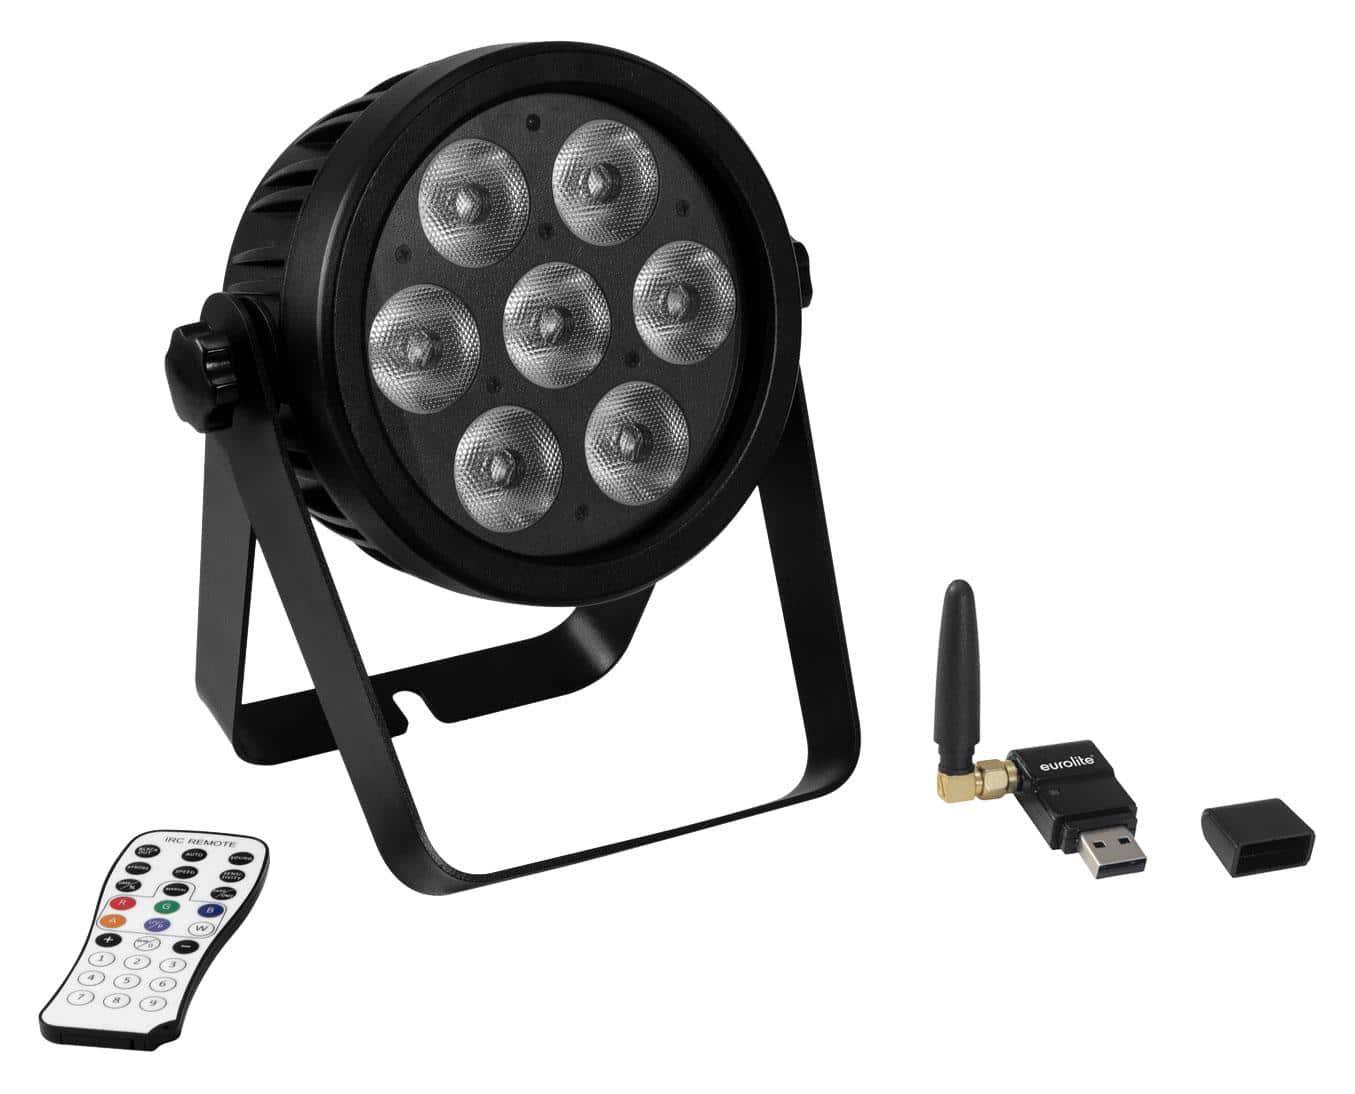 Lichtsets - Eurolite LED 7C 7 Silent Slim Spot QuickDMX Set - Onlineshop Musikhaus Kirstein